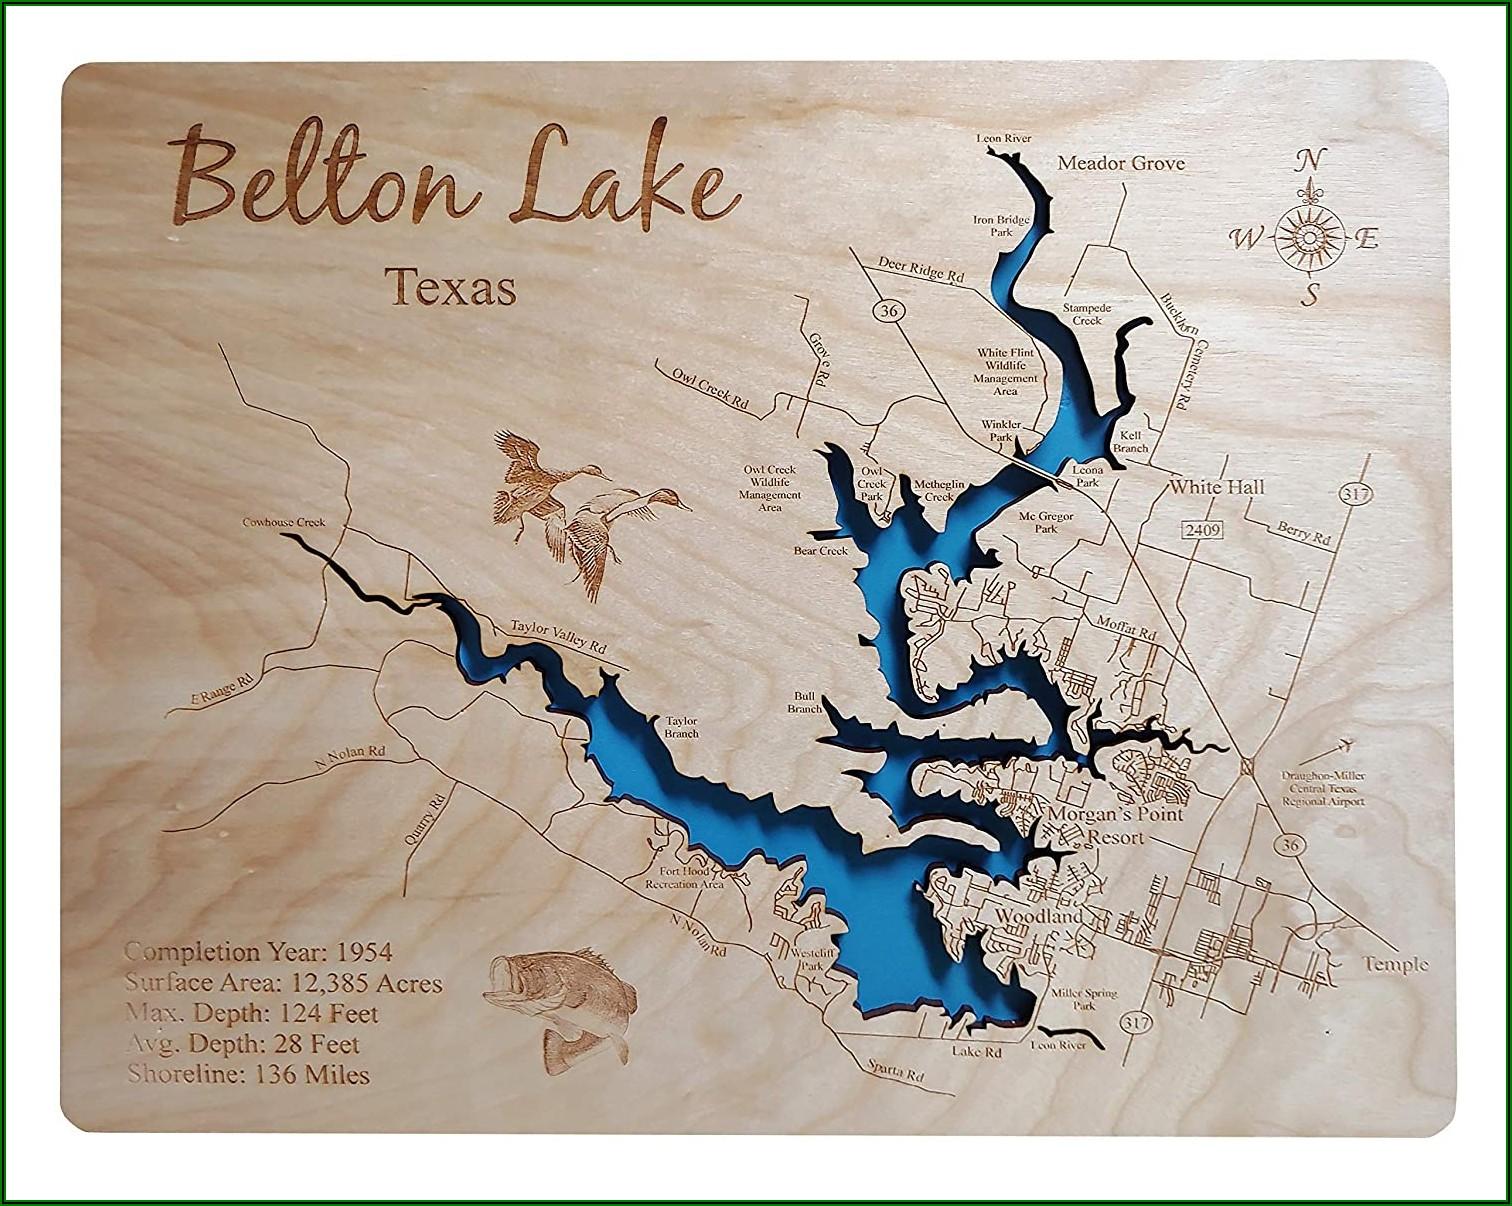 Stillhouse Hollow Lake Topographic Map